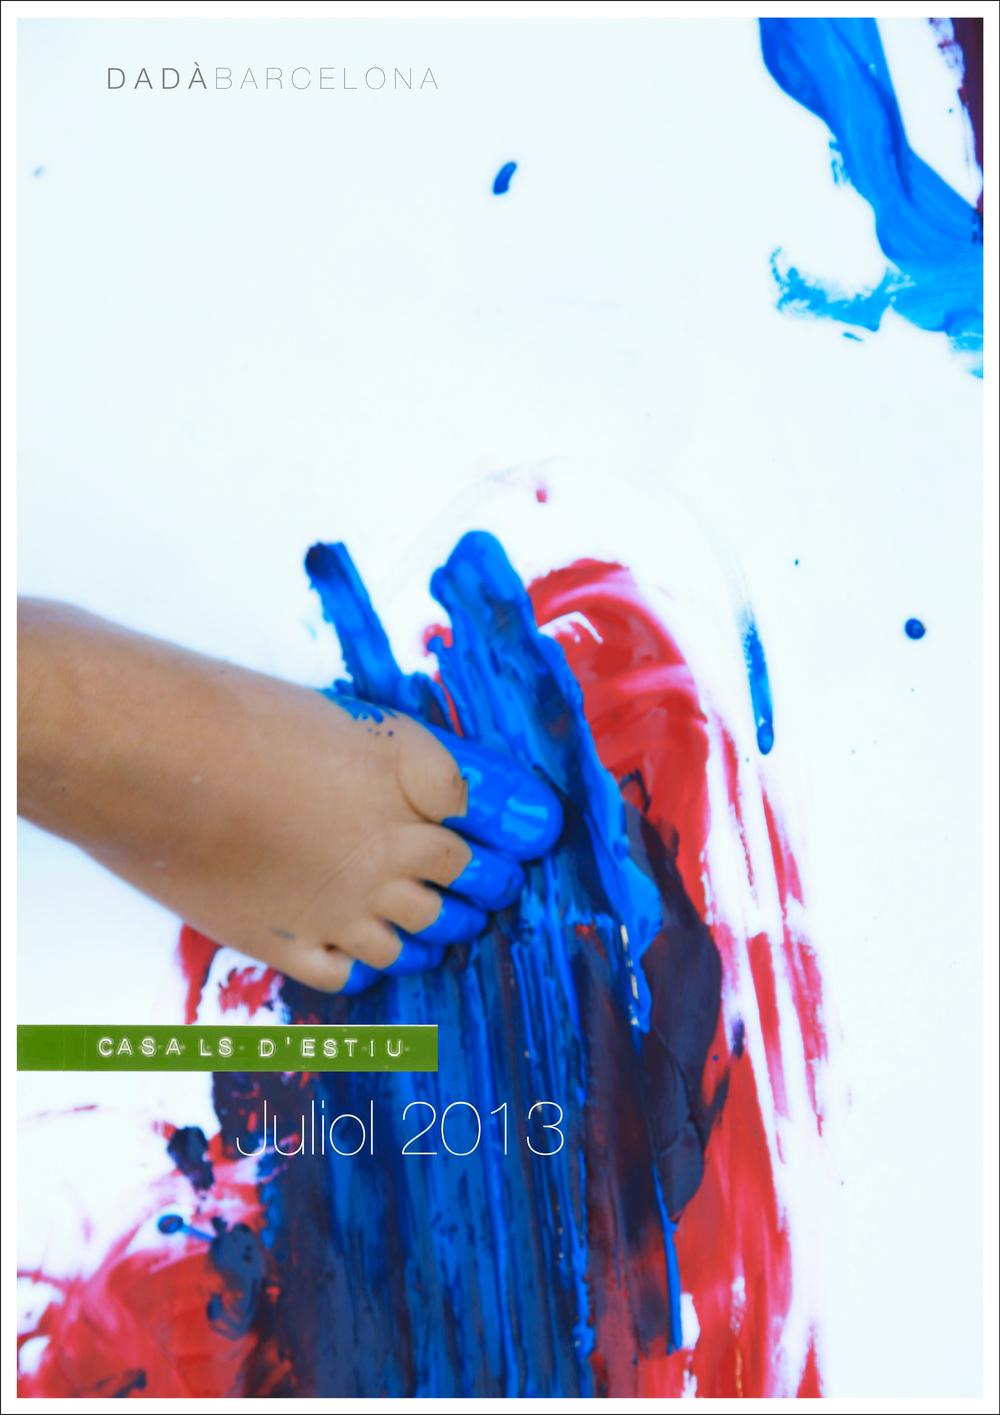 Tallers   d'estiu 2013  [PDF]